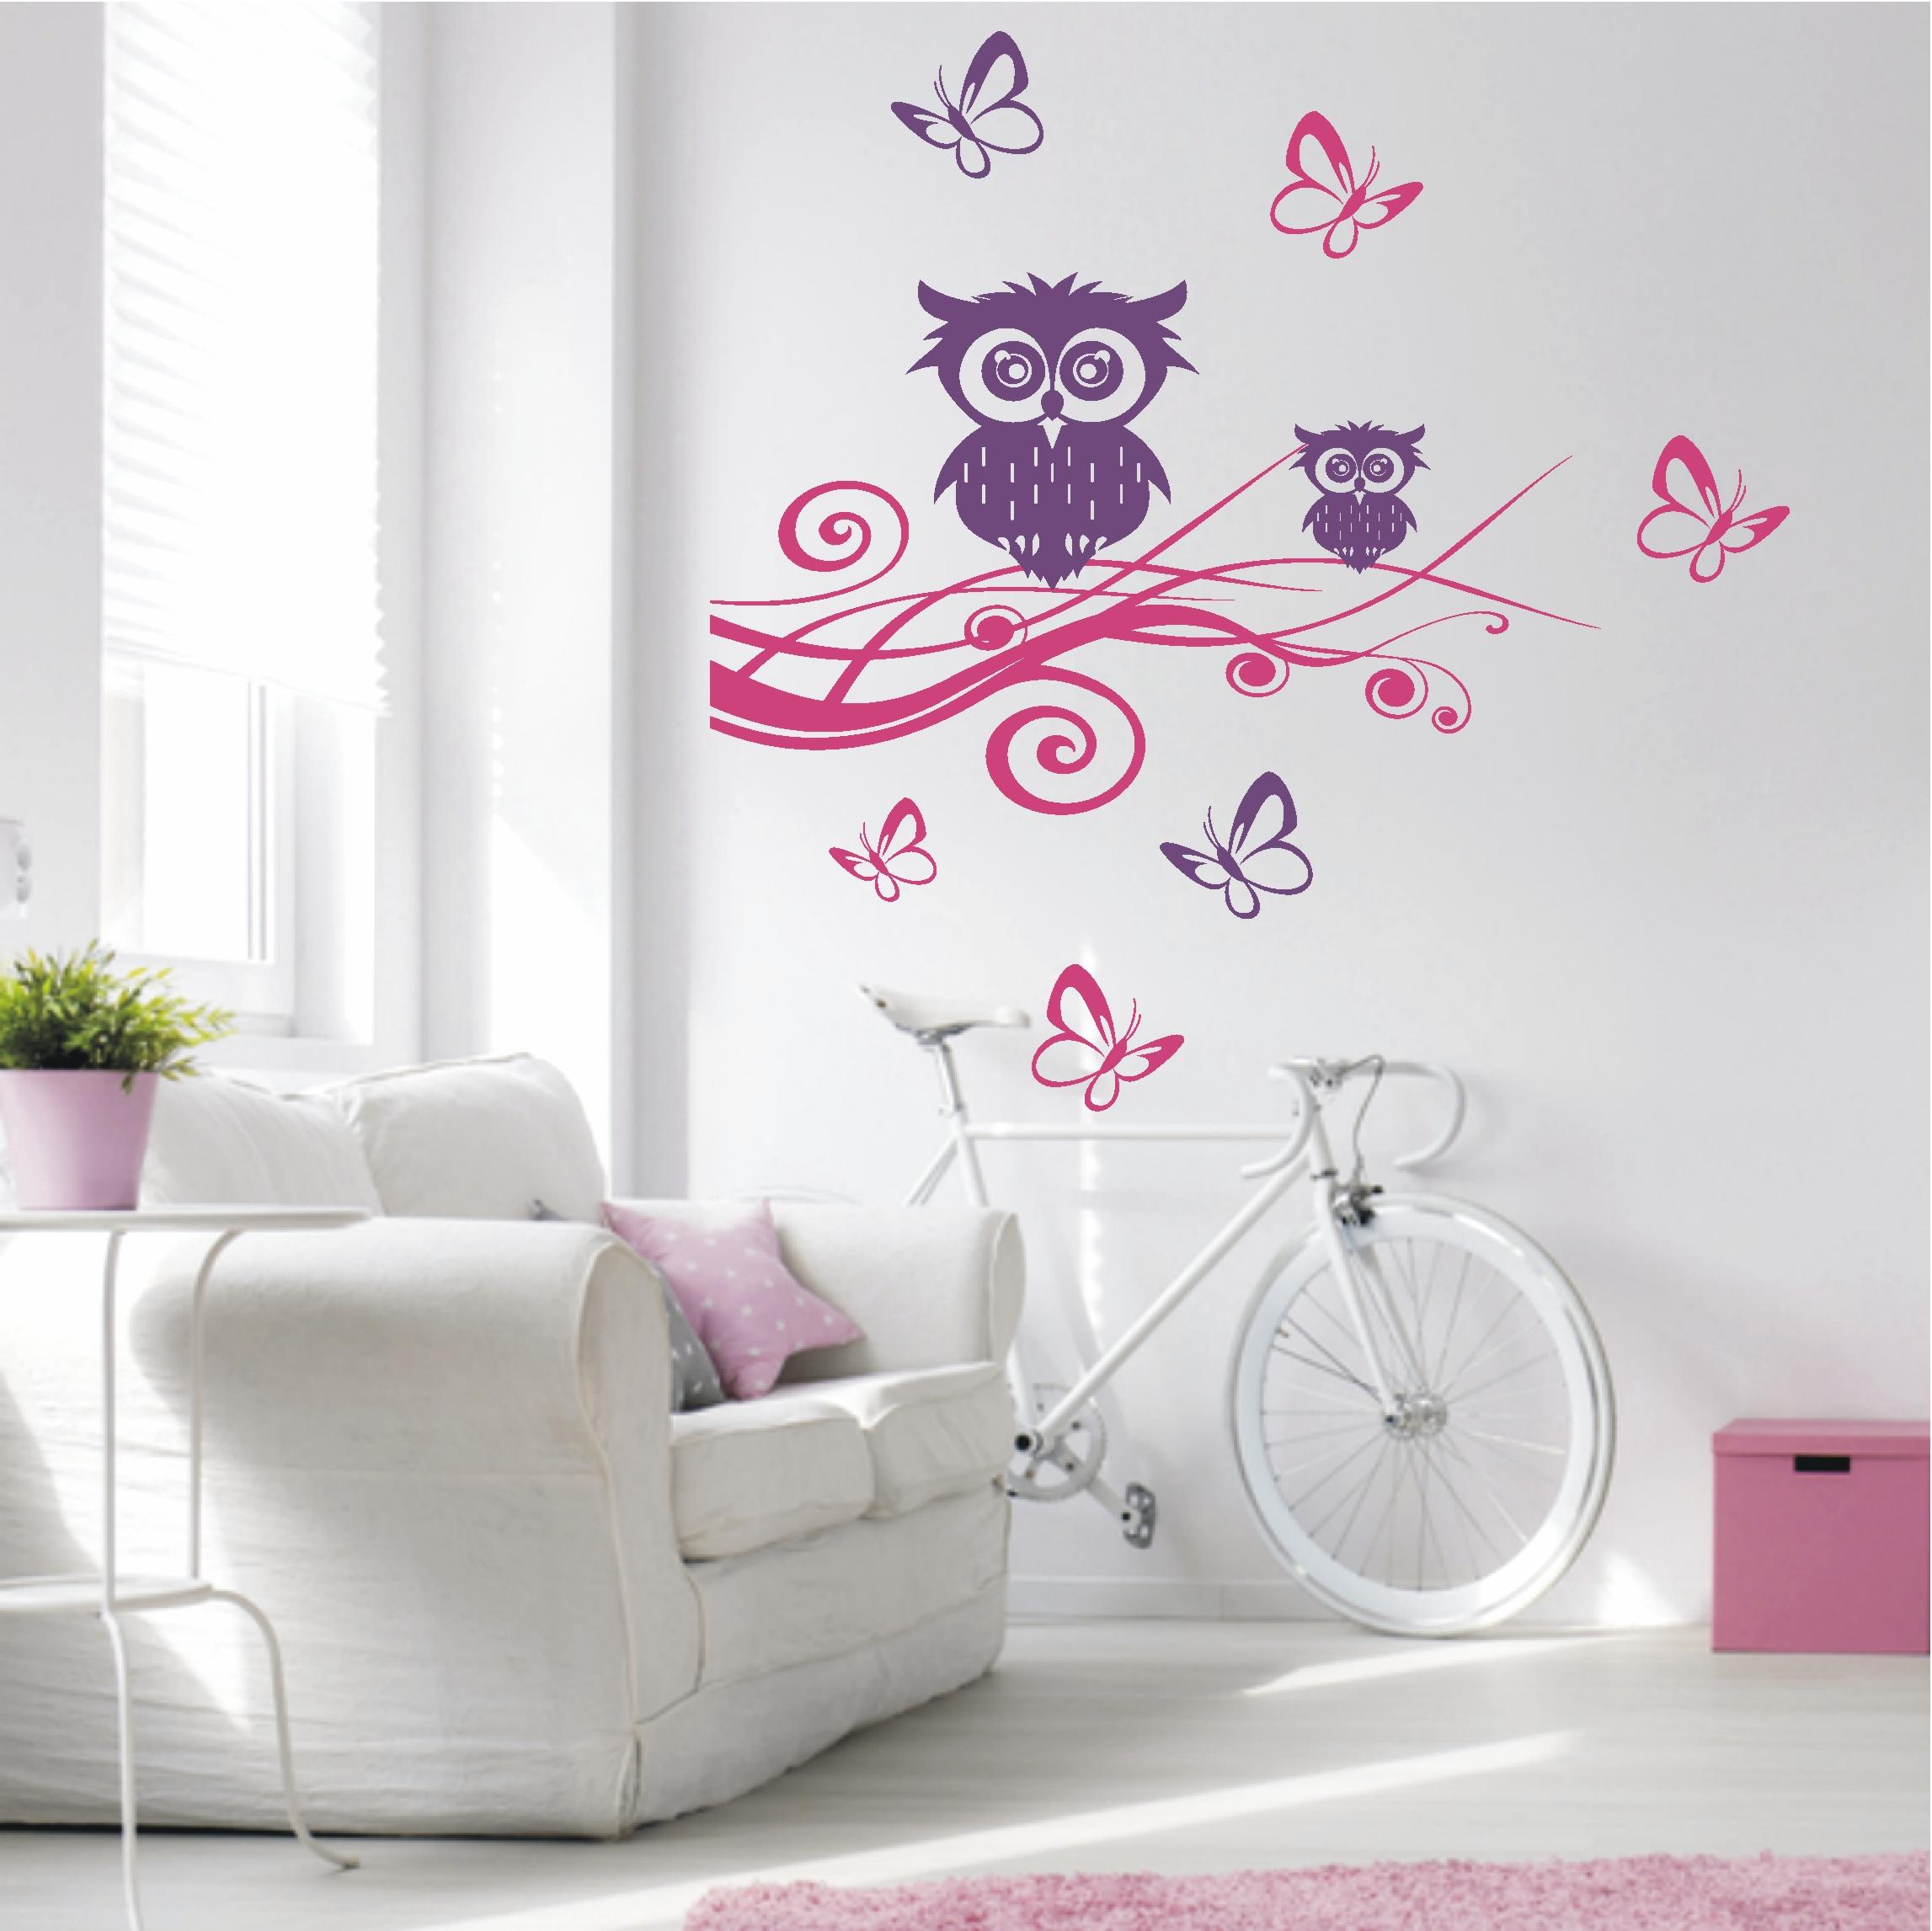 deko shop wandtattoo eulen auf ast deko shop. Black Bedroom Furniture Sets. Home Design Ideas